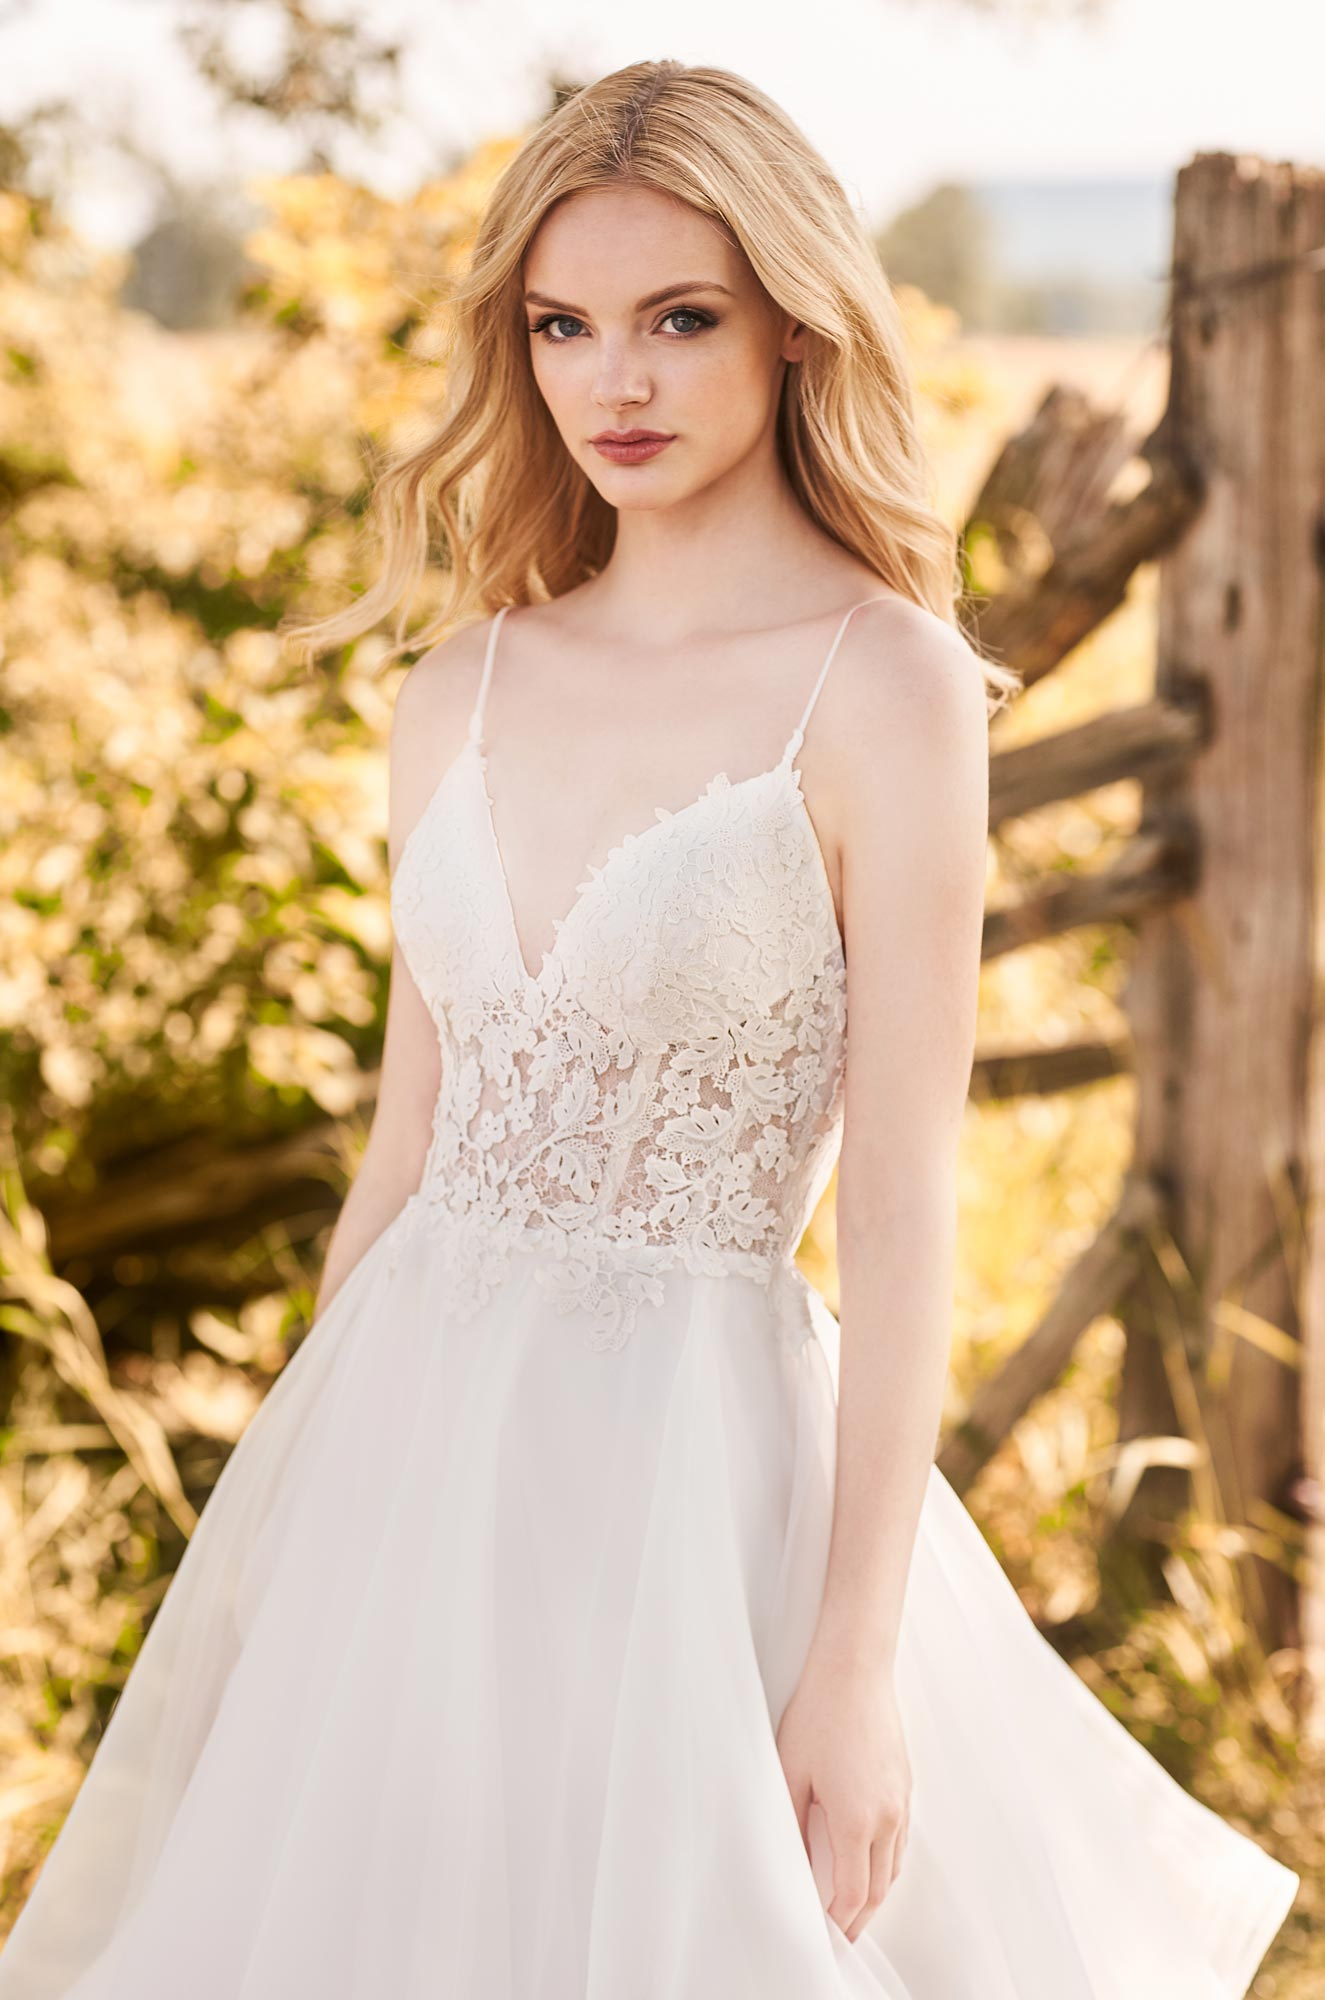 Fairytale Organza Skirt Wedding Dress – Style #2287 | Mikaella Bridal